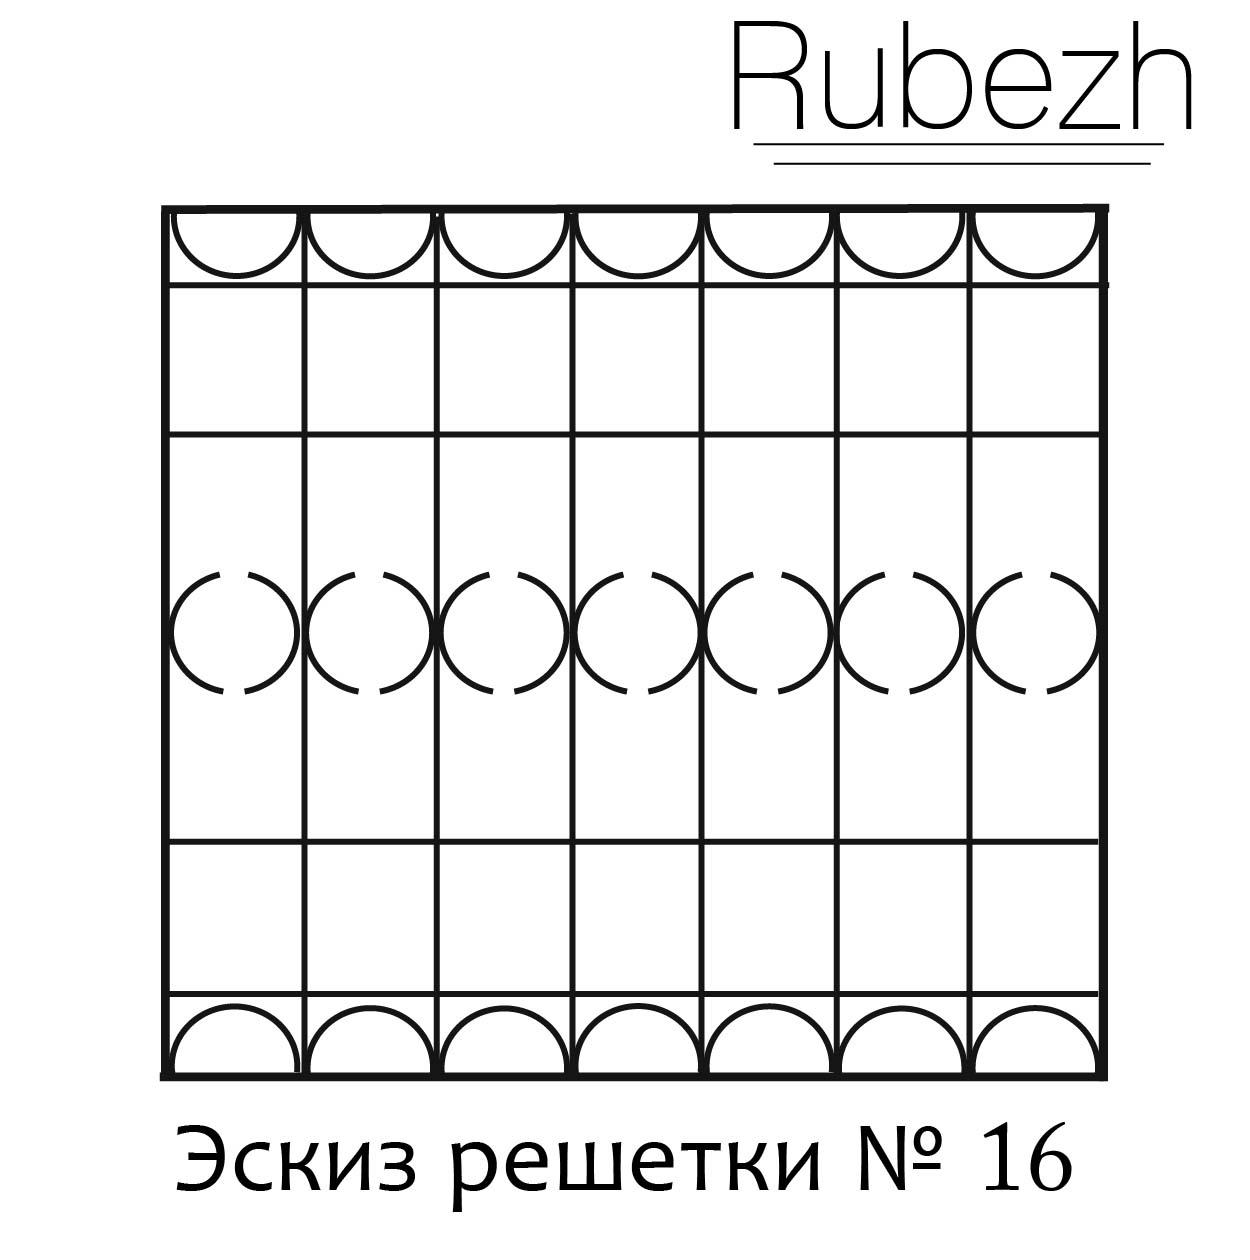 Эскиз решетки № 16